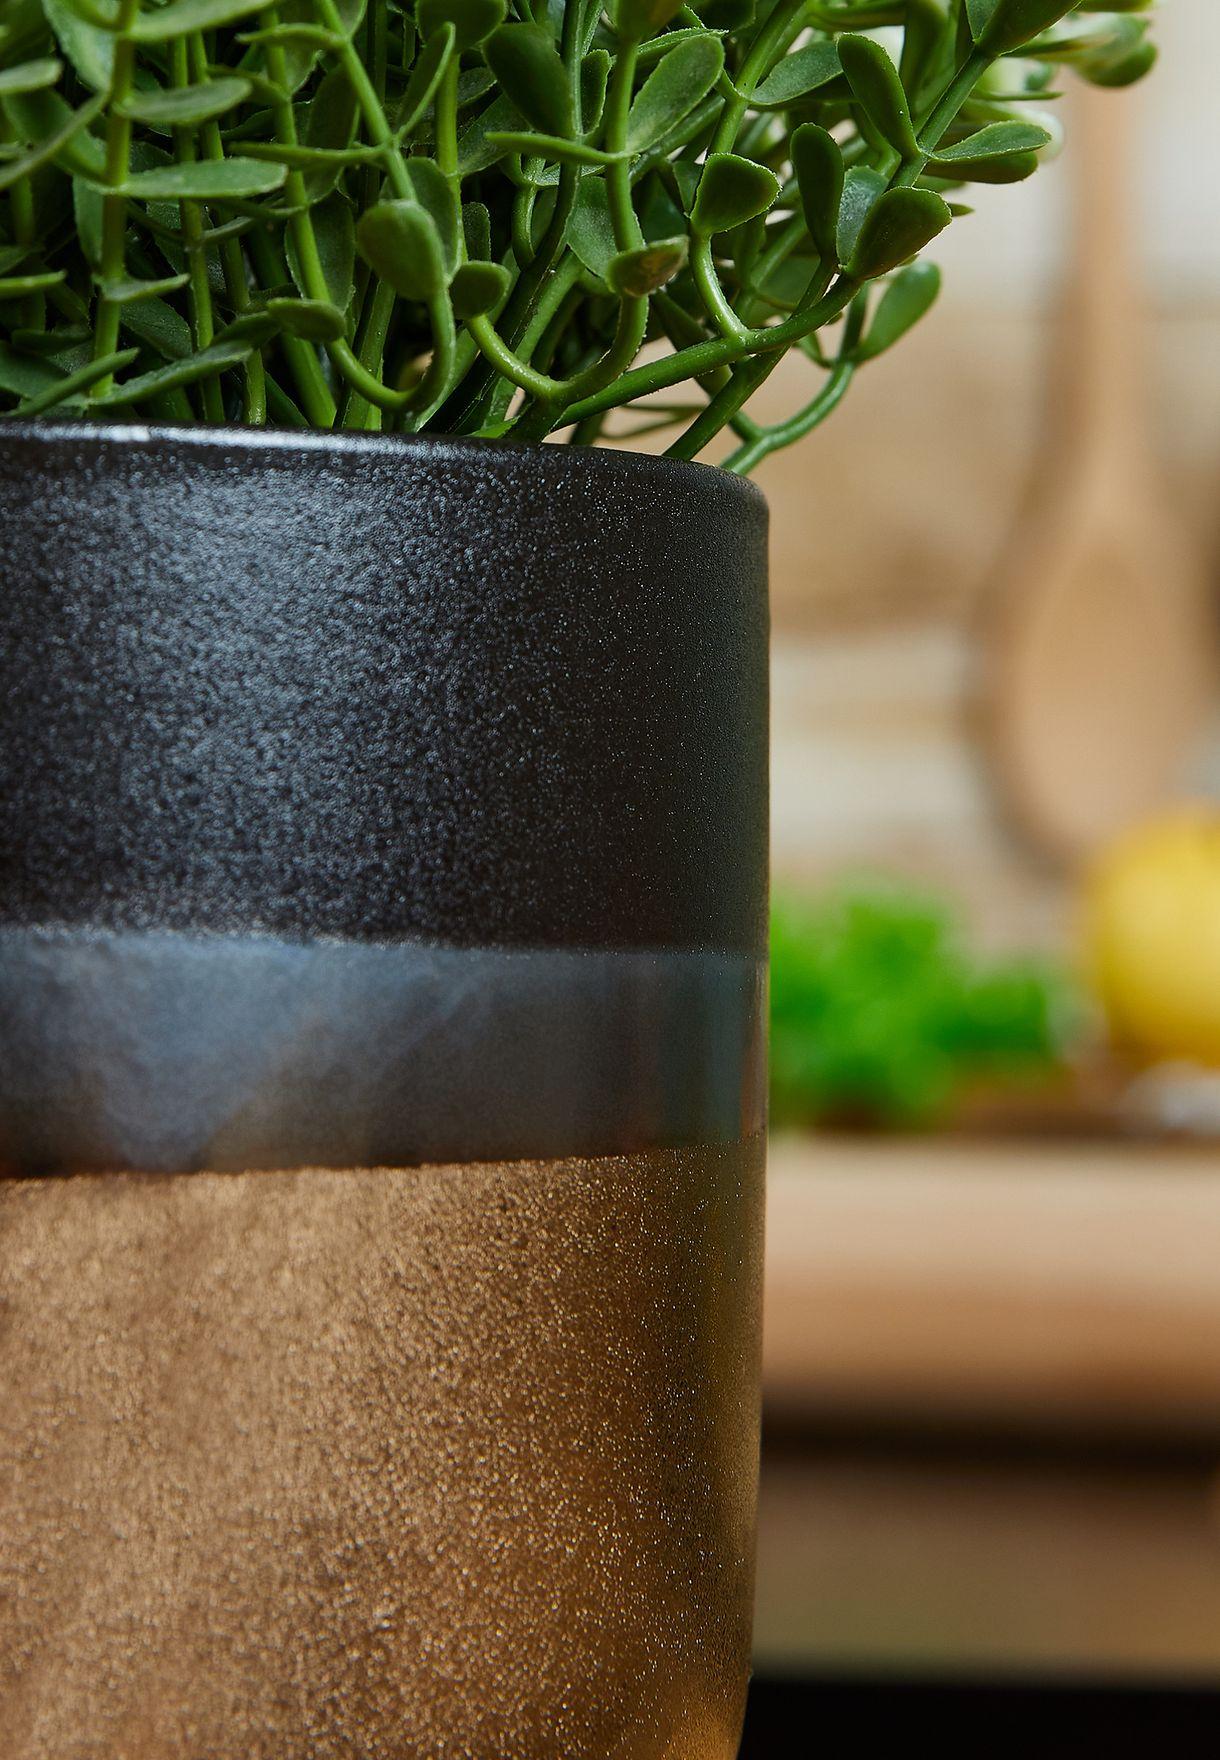 Nixon Stoneware Black & Metallic Finish Planter